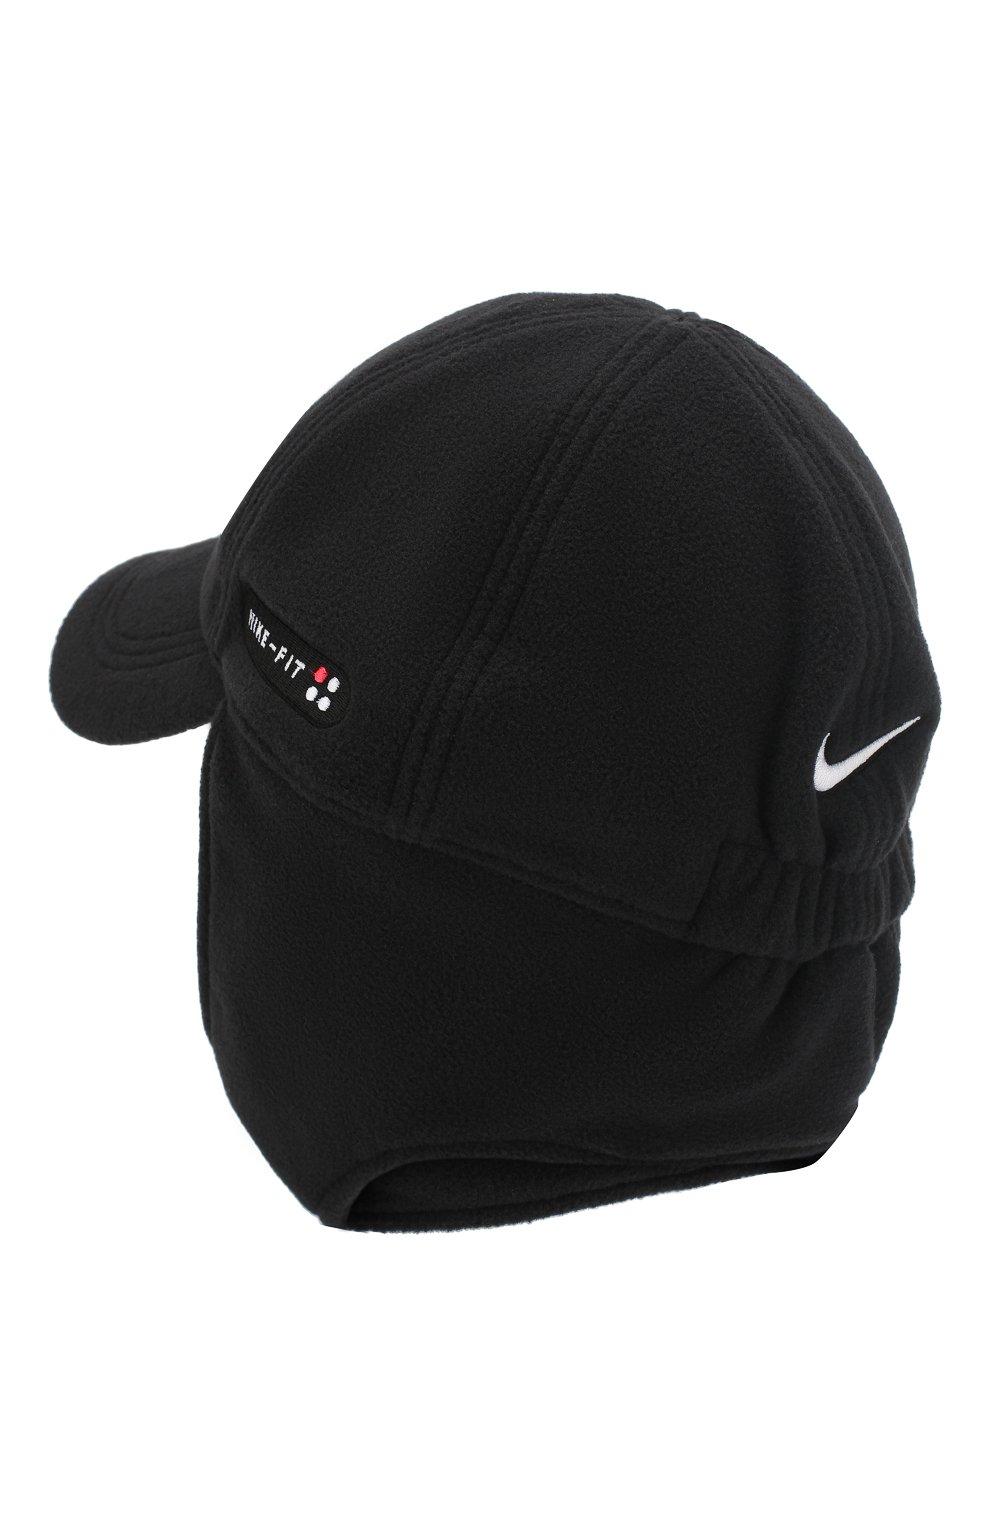 1fe77b814b4 Бейсболка Nike X Skepta H86 Earflap QS Black NikeLab черно-белого цвета